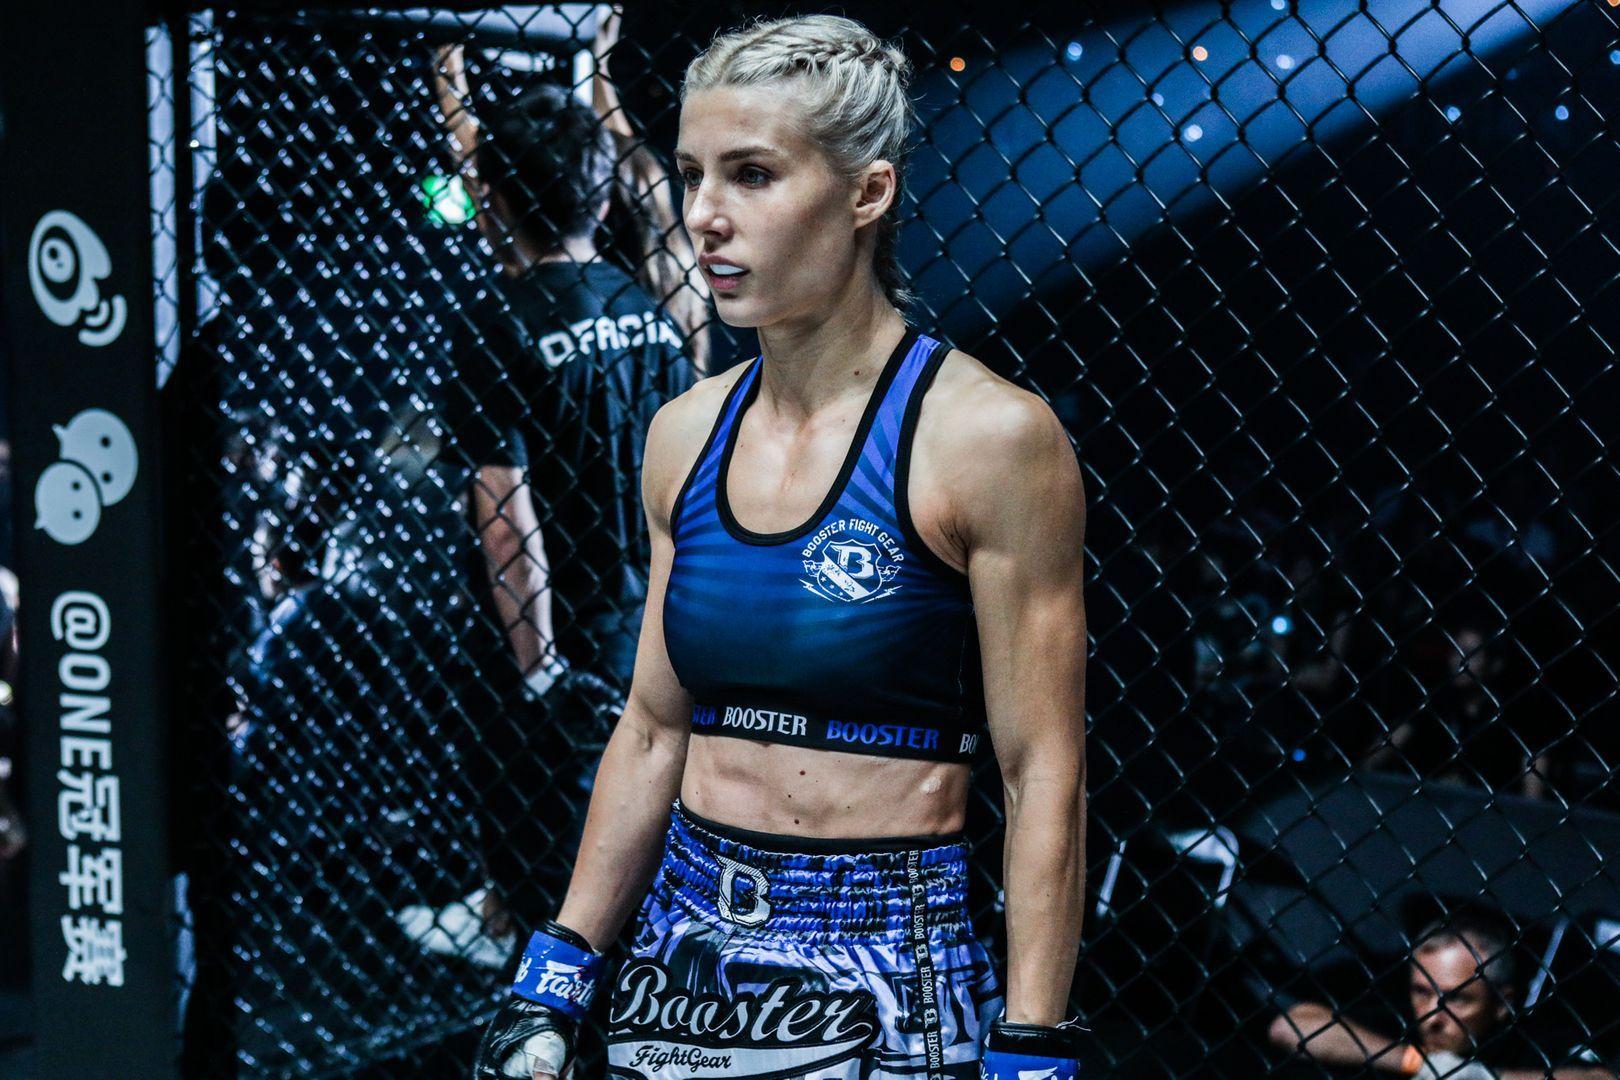 Muay Thai World Champion Ekaterina Vandaryeva stands in the cage